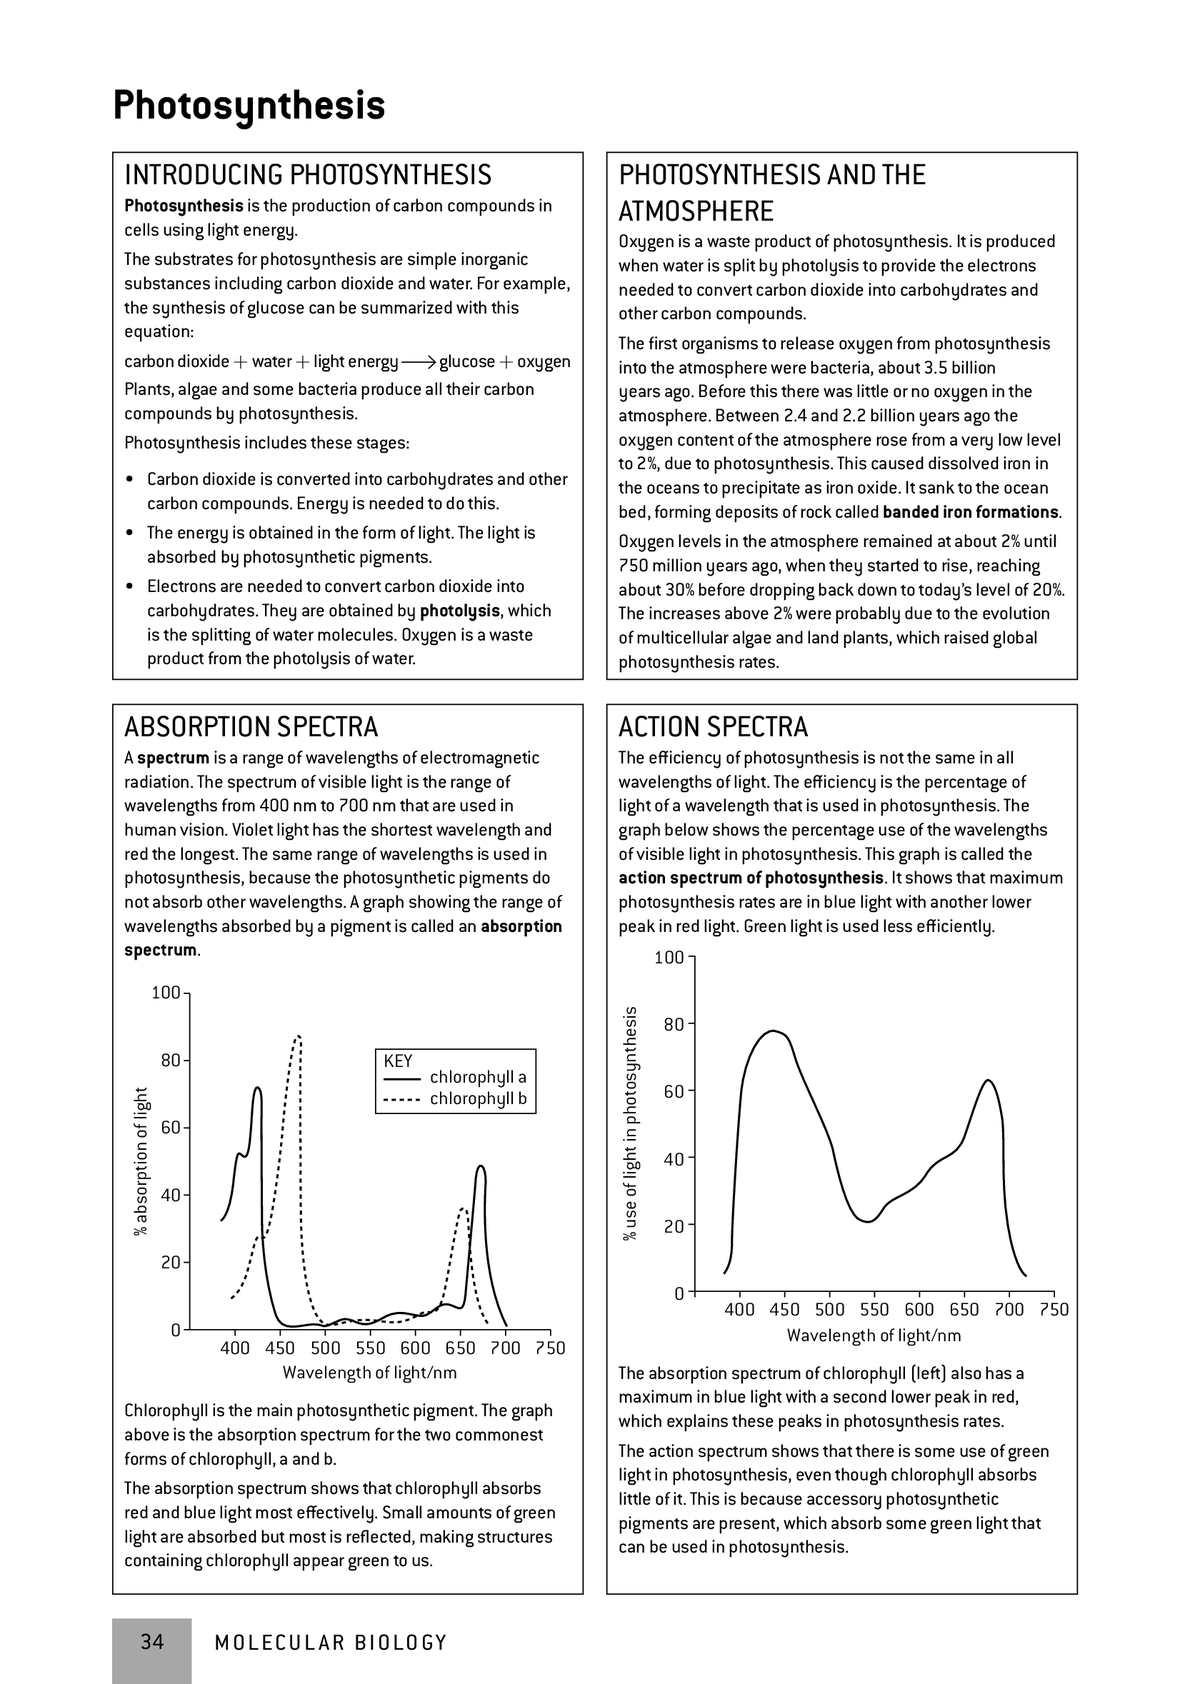 Amazon.com: IB Biology Study Guide: 2014 edition: Oxford ...